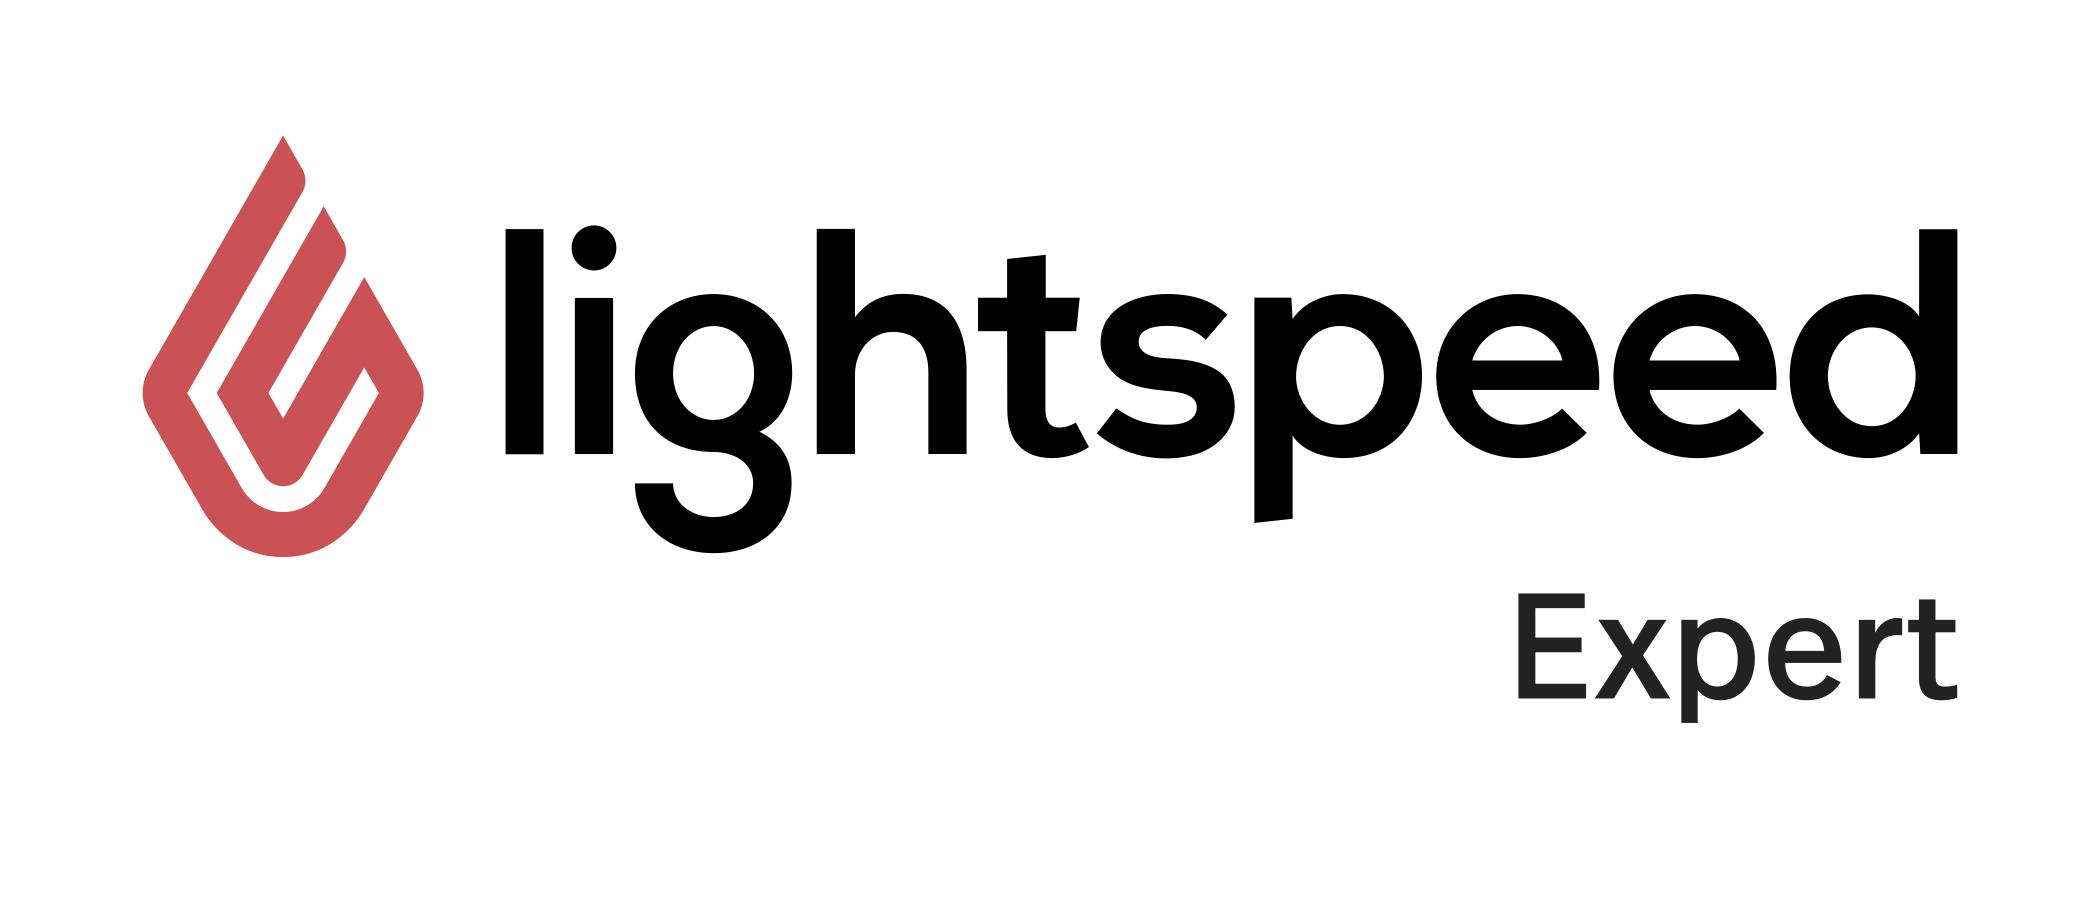 Lightspeed_Expert_RGB.jpg